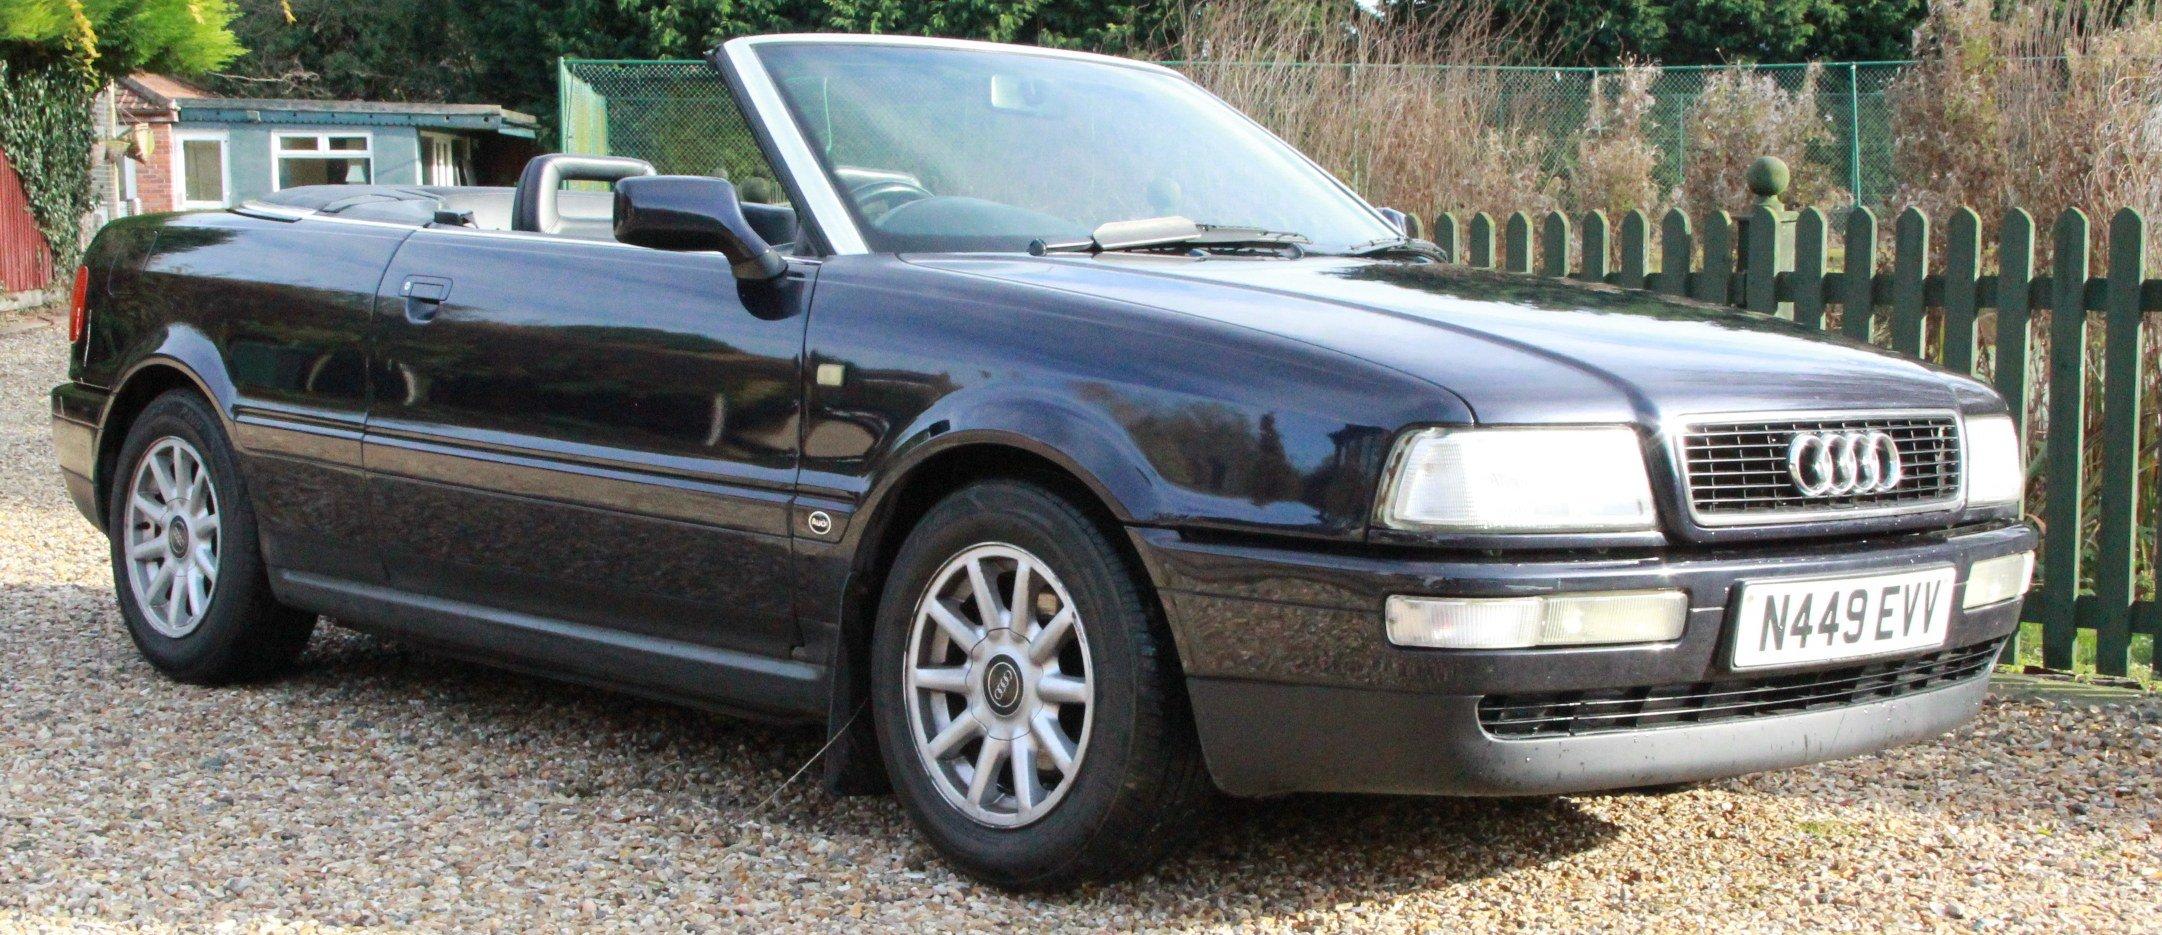 1995 Audi 80 2.0 Manual Convertible Very Original Car For Sale (picture 3 of 6)